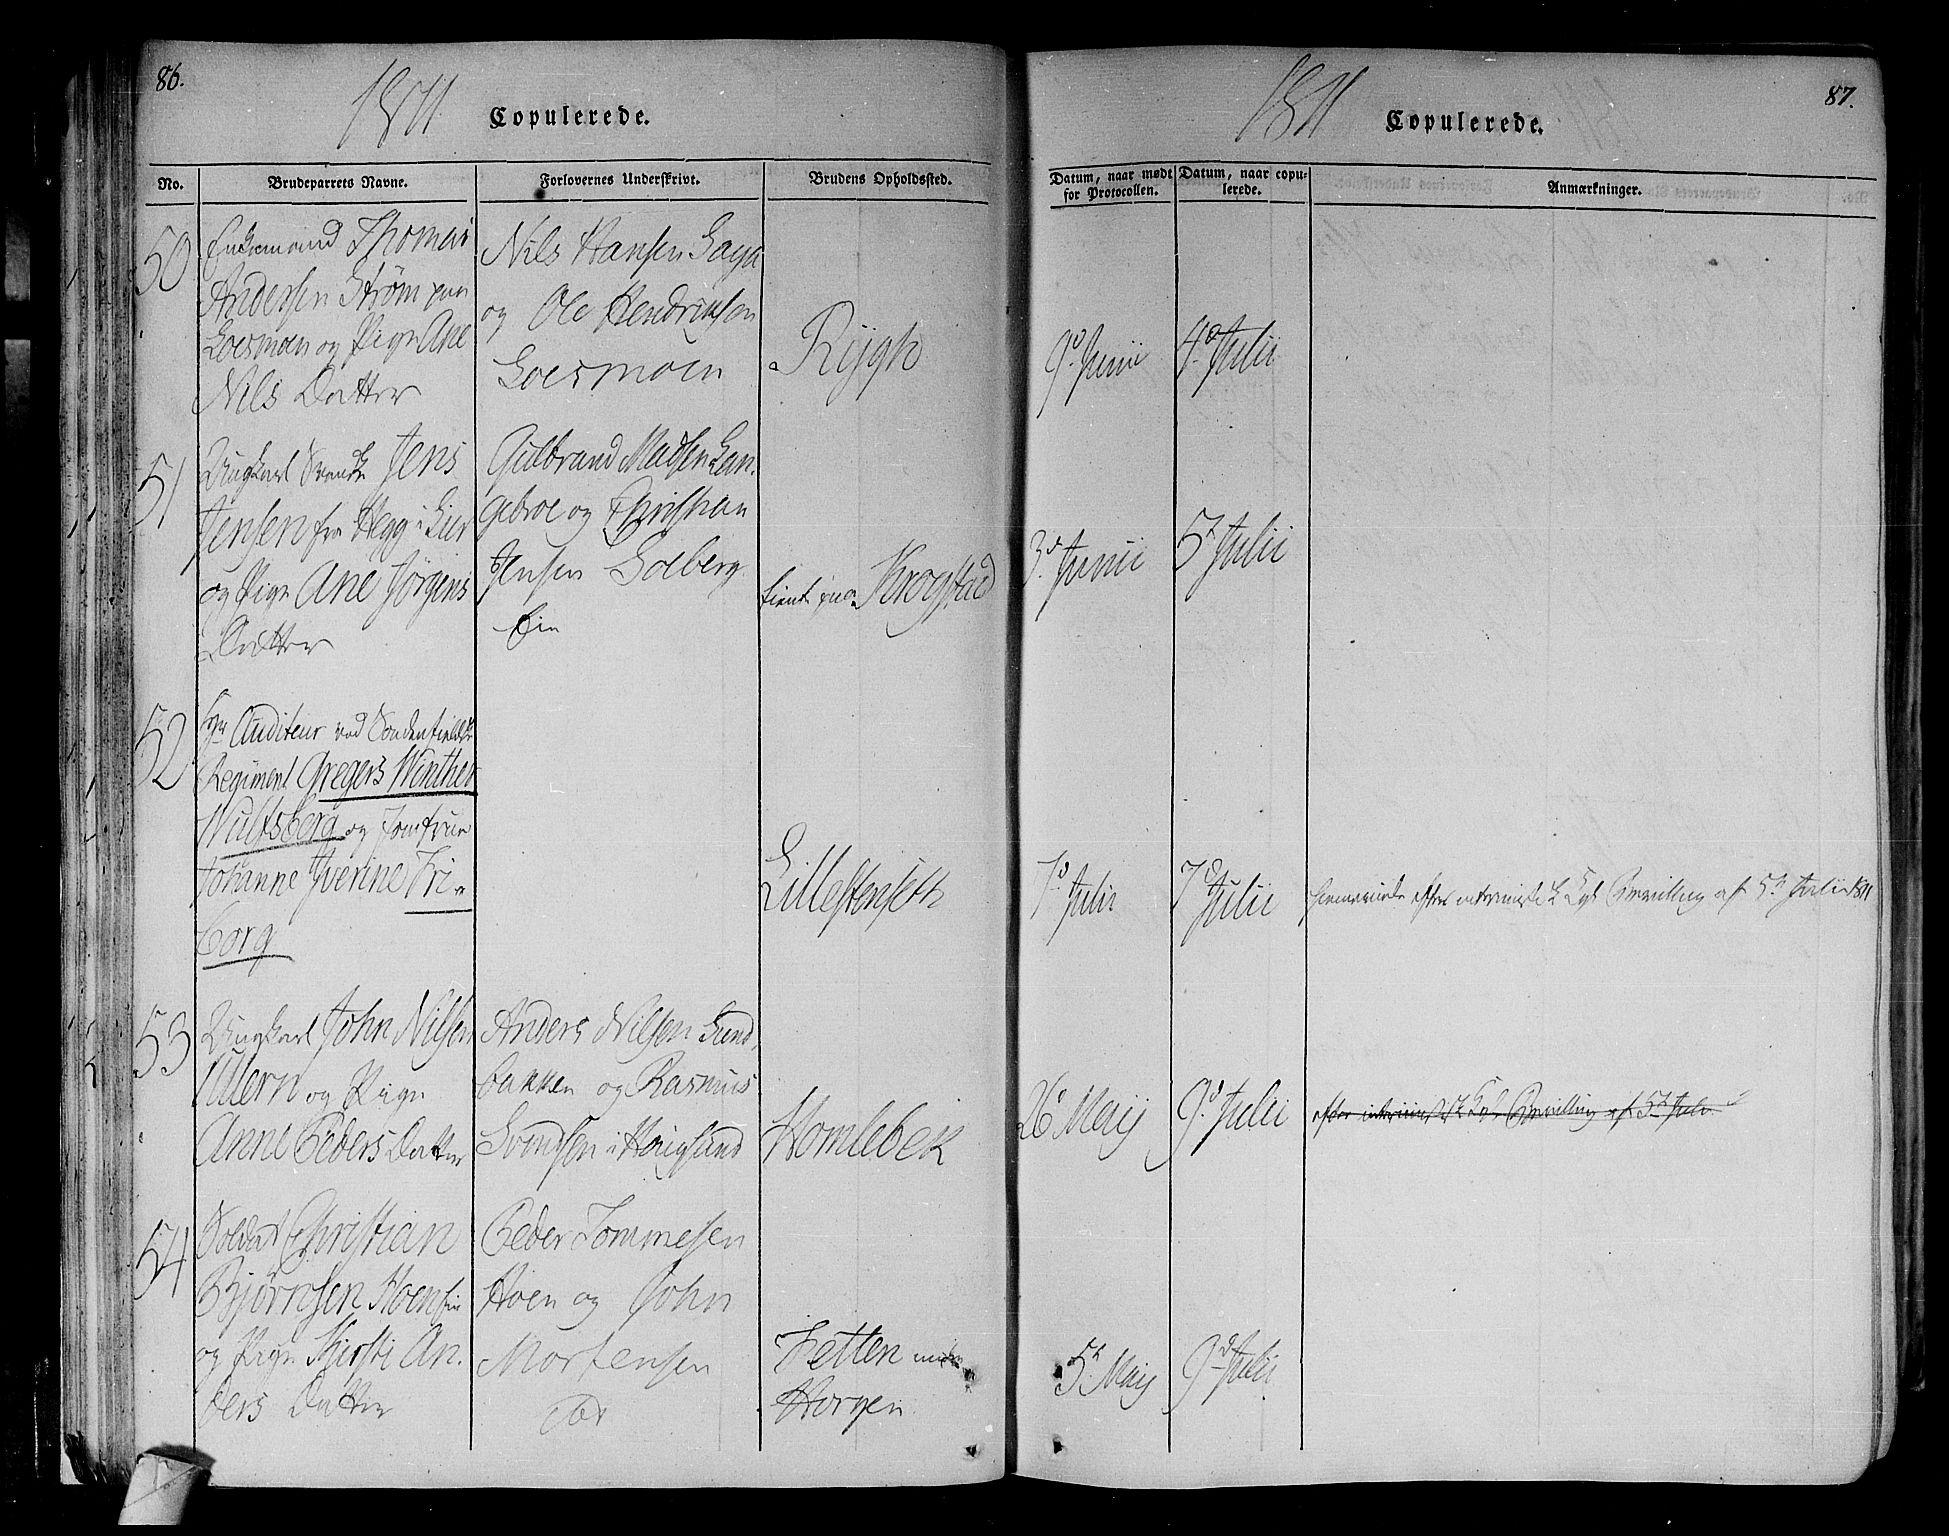 SAKO, Eiker kirkebøker, F/Fa/L0010: Ministerialbok nr. I 10, 1806-1815, s. 86-87